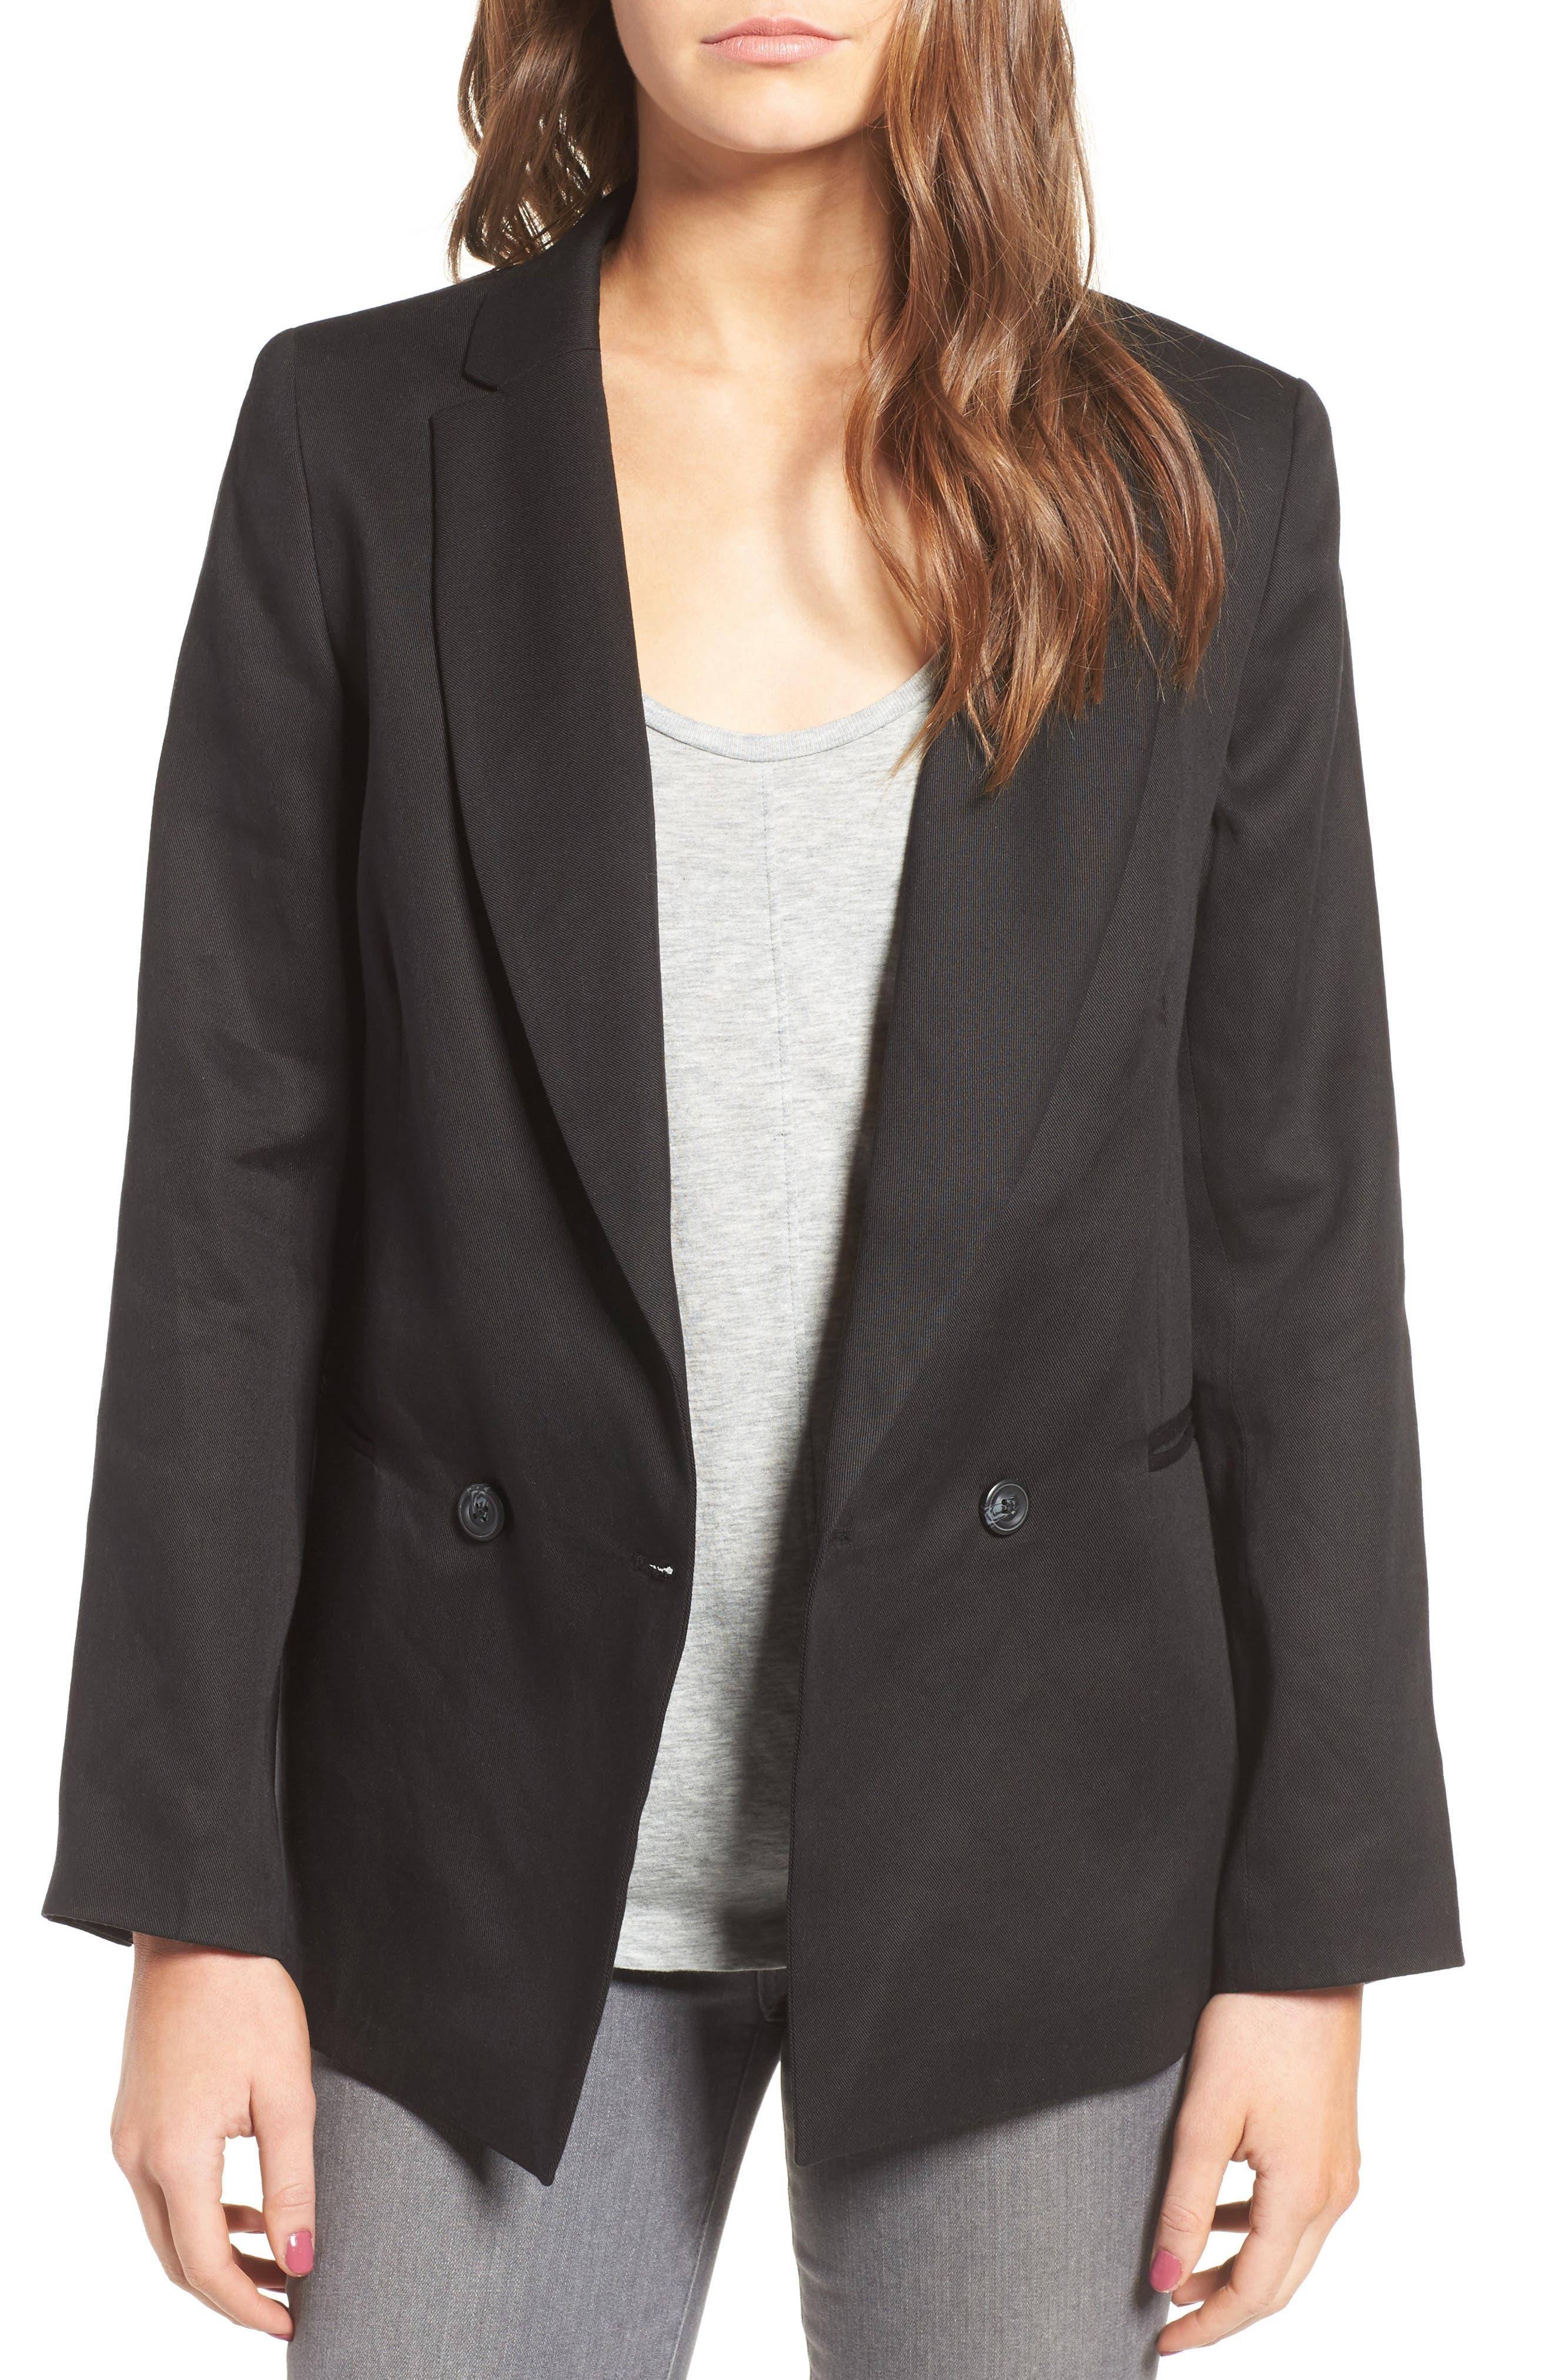 Alternate Image 1 Selected - Sincerely Jules 'Riley' Notch Collar Blazer